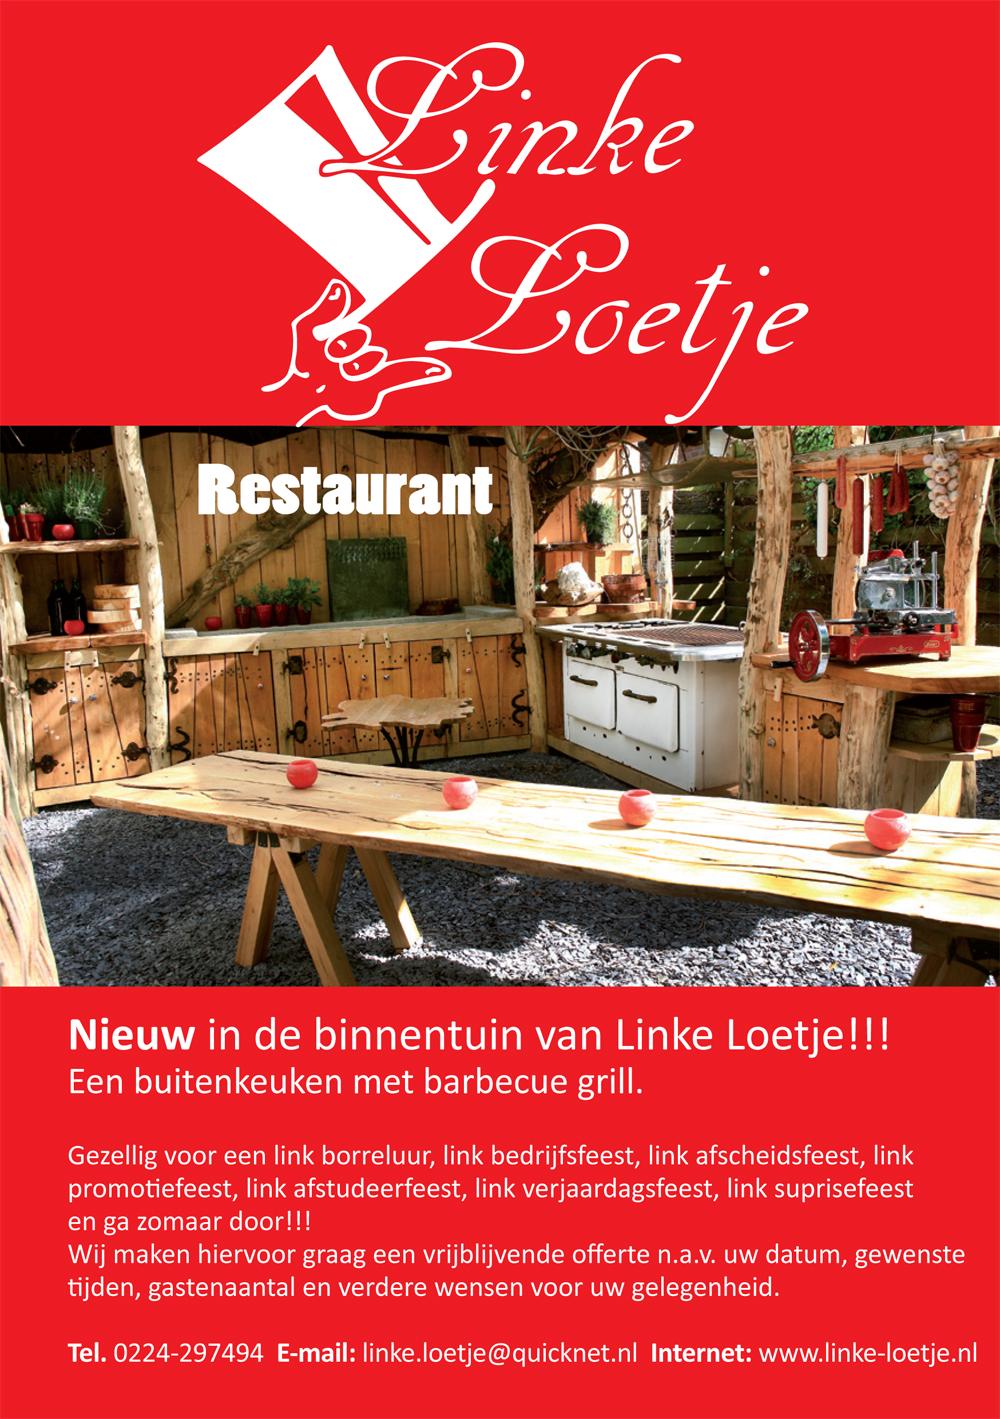 Welkom Bij Linke Loetje Linke Loetje Restaurant